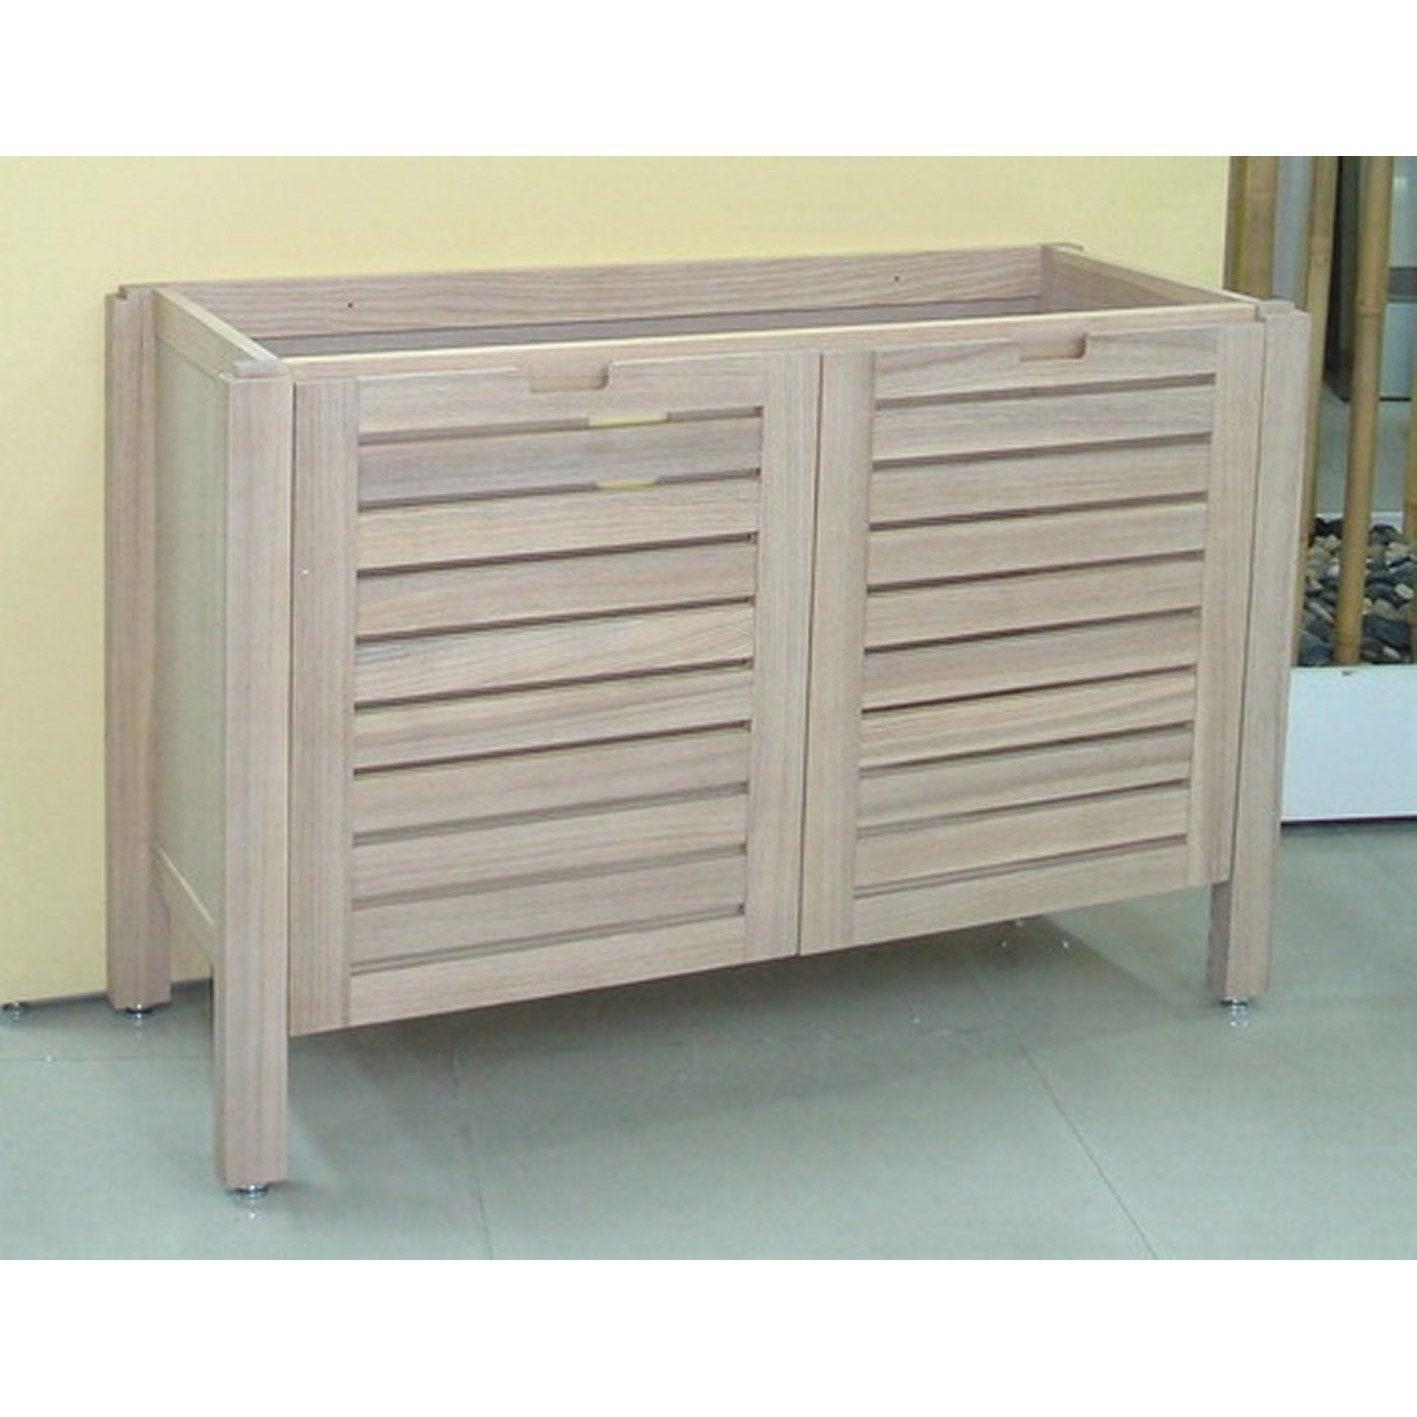 caisson meuble salle de bain perfect caisson meuble salle. Black Bedroom Furniture Sets. Home Design Ideas